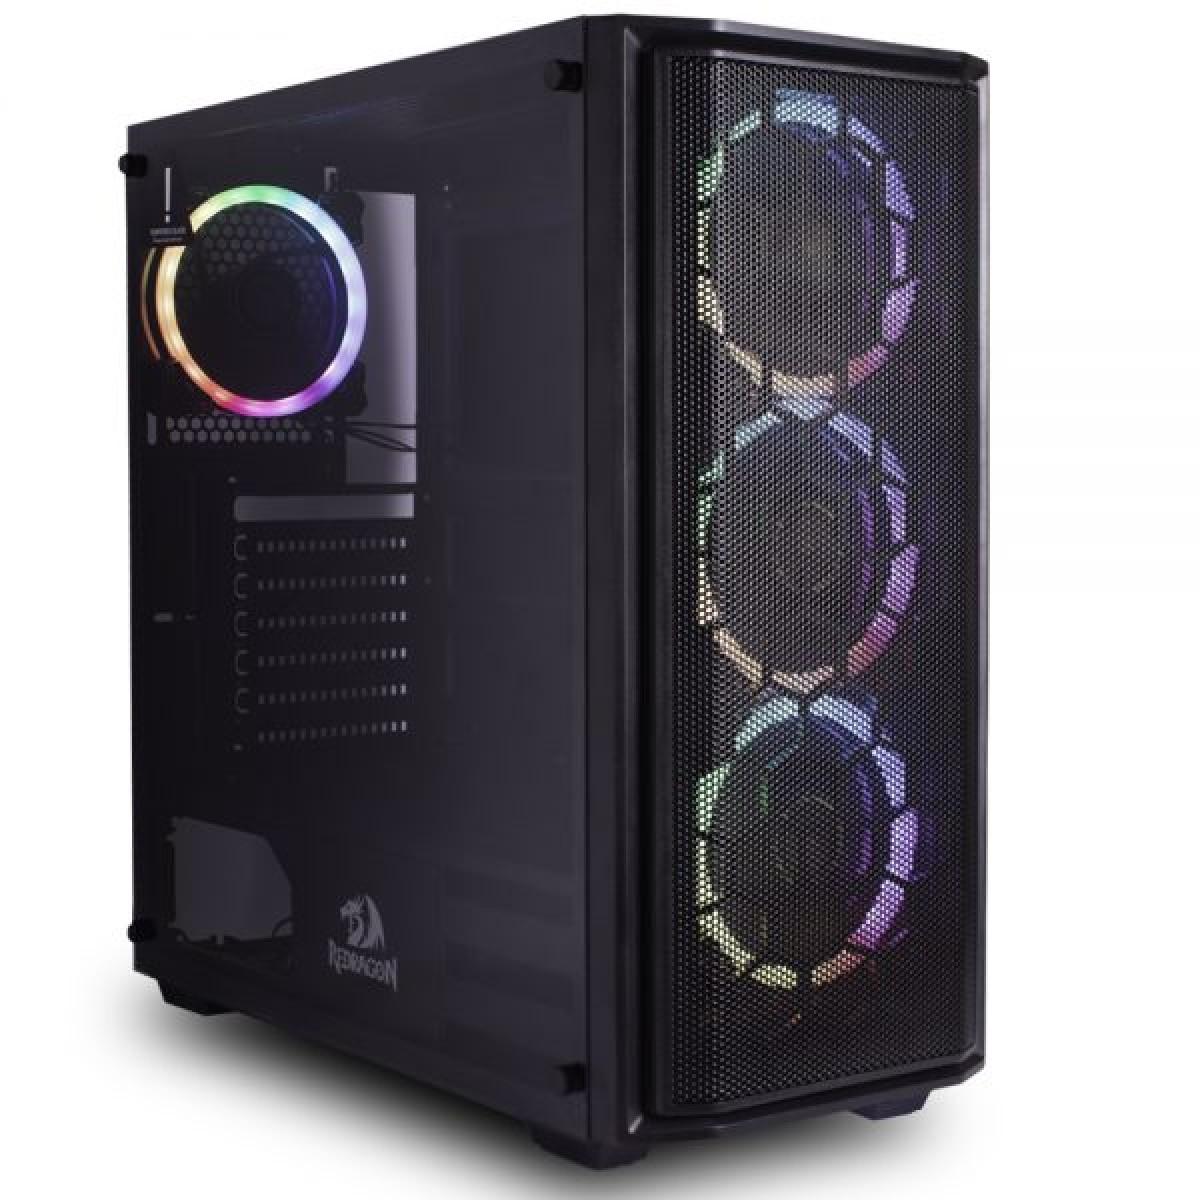 PC Gamer T-Power Captain Lvl-5 Intel I7 9700KF 3.60GHz / Geforce RTX 2080 Super / 16GB DDR4 / HD 1TB / 600W